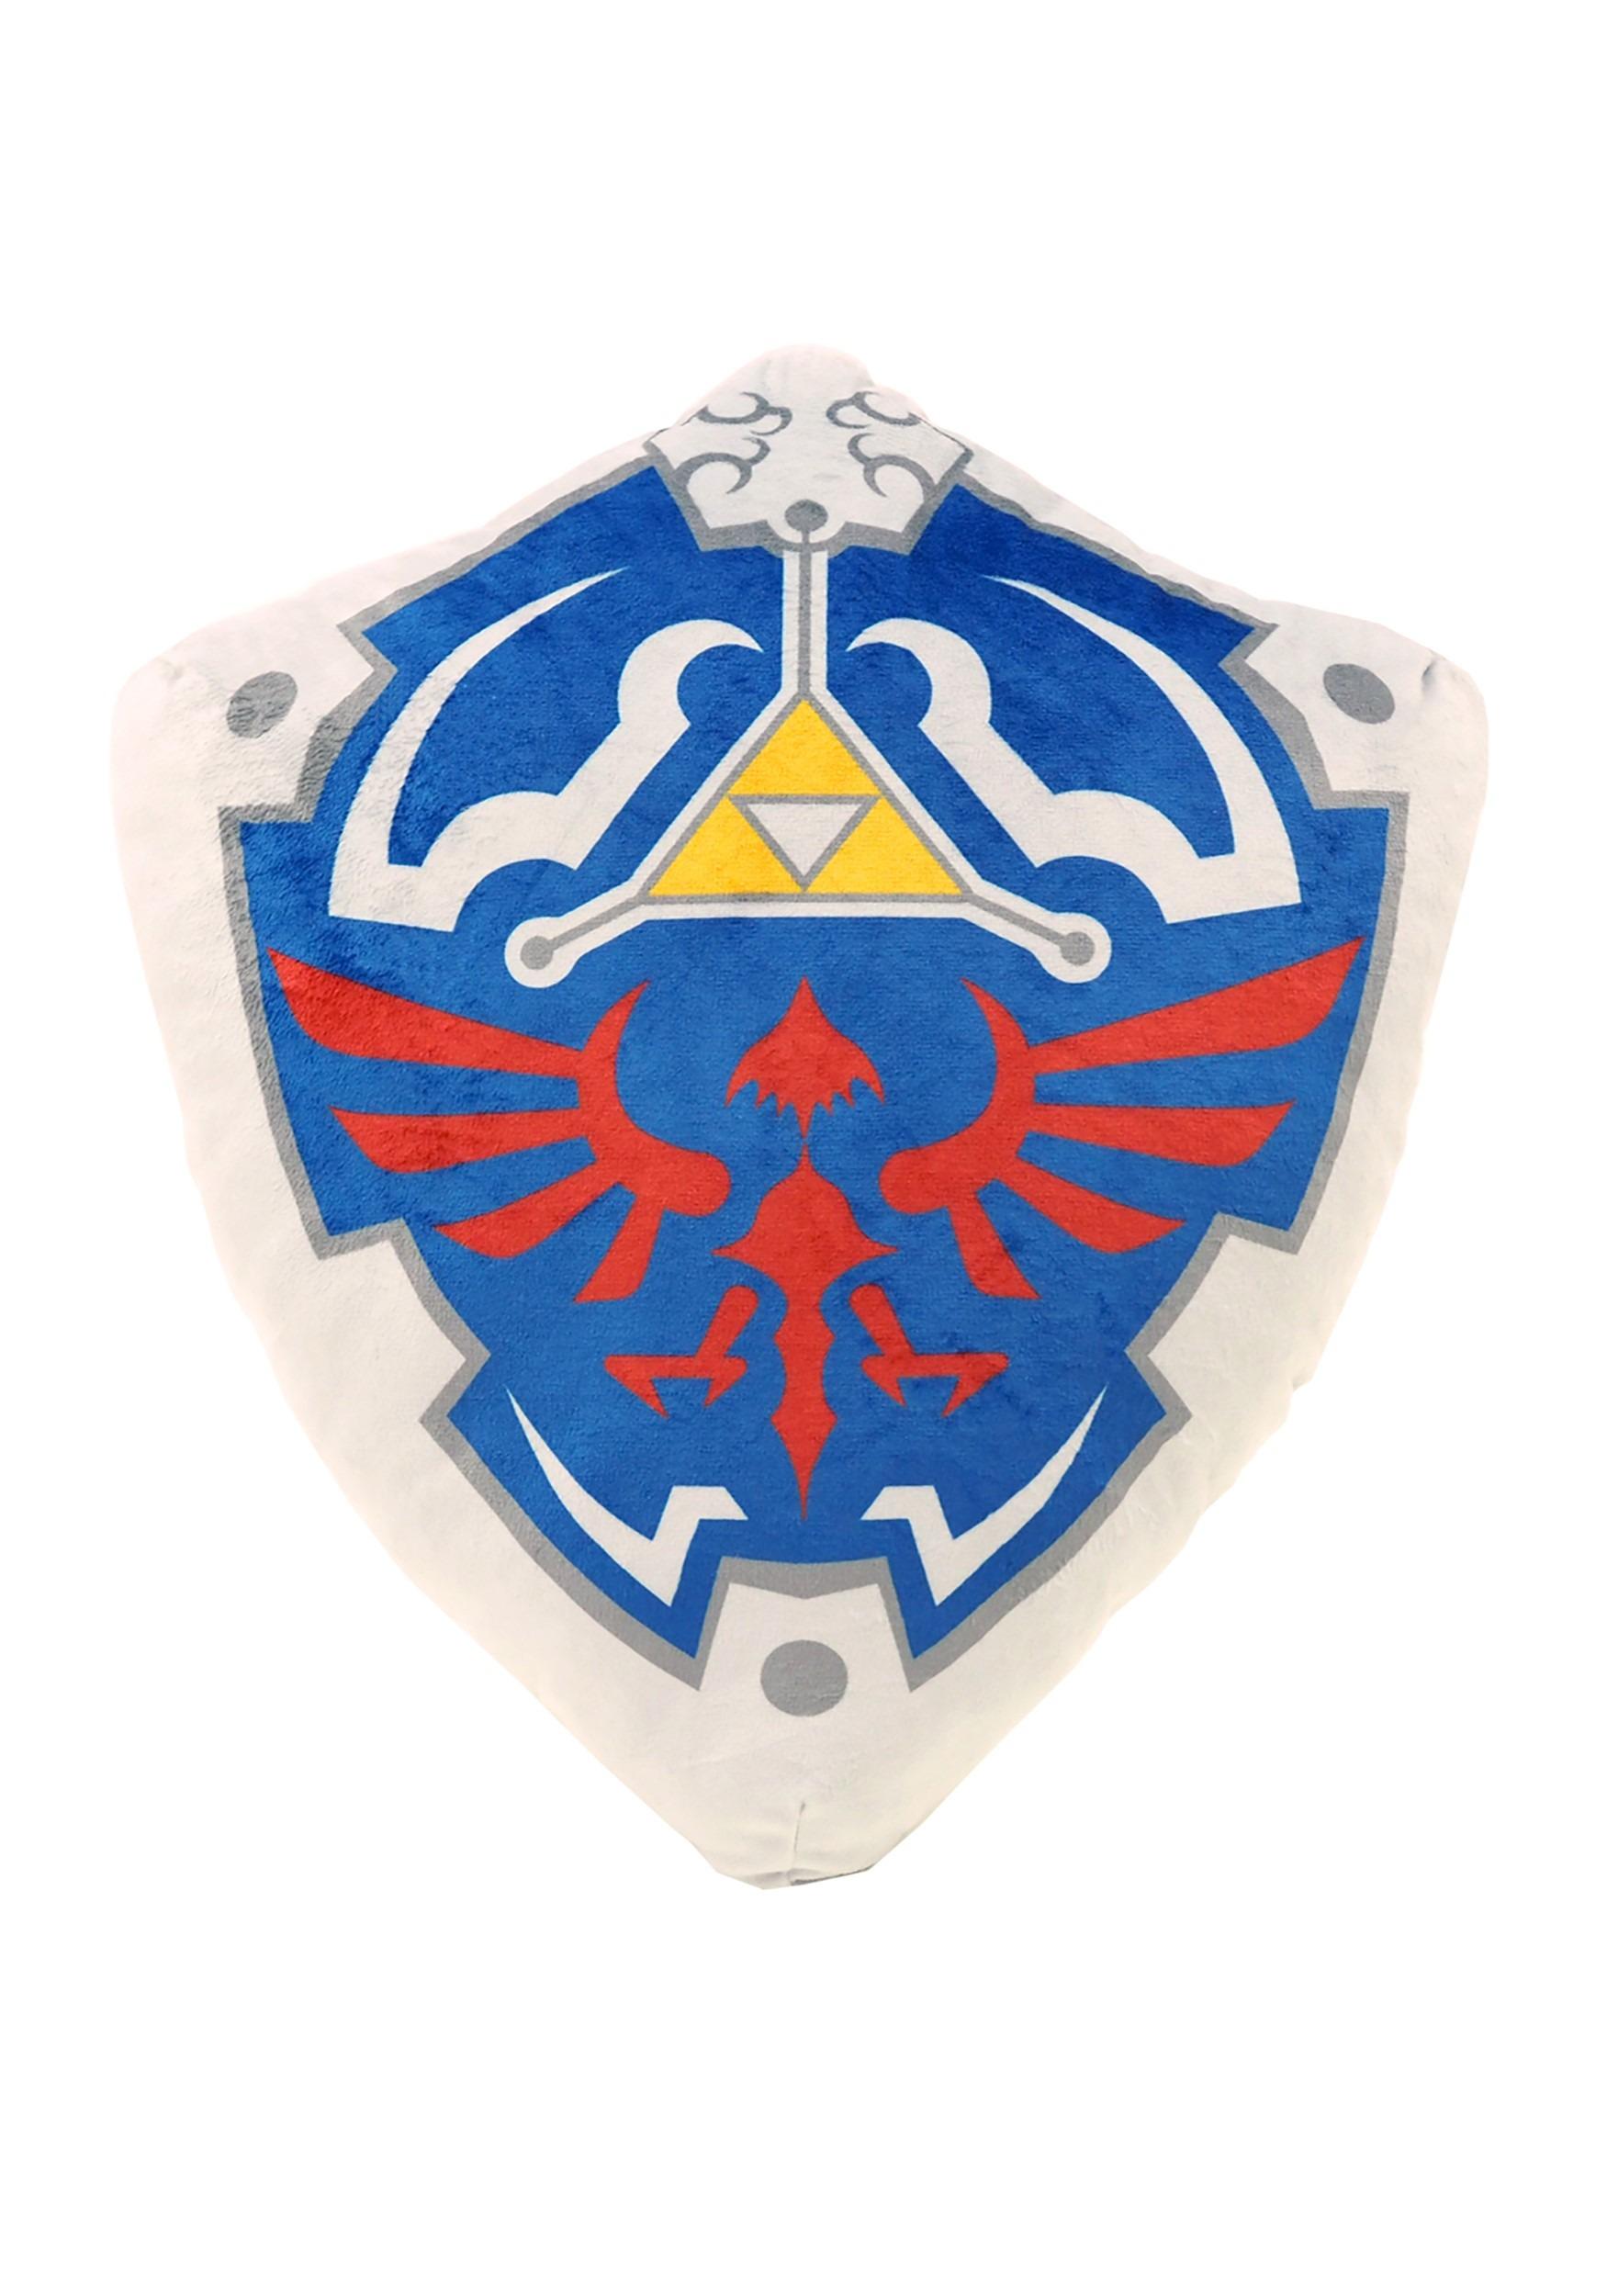 Legend of Zelda Hylian Shield Stuffed Cushion